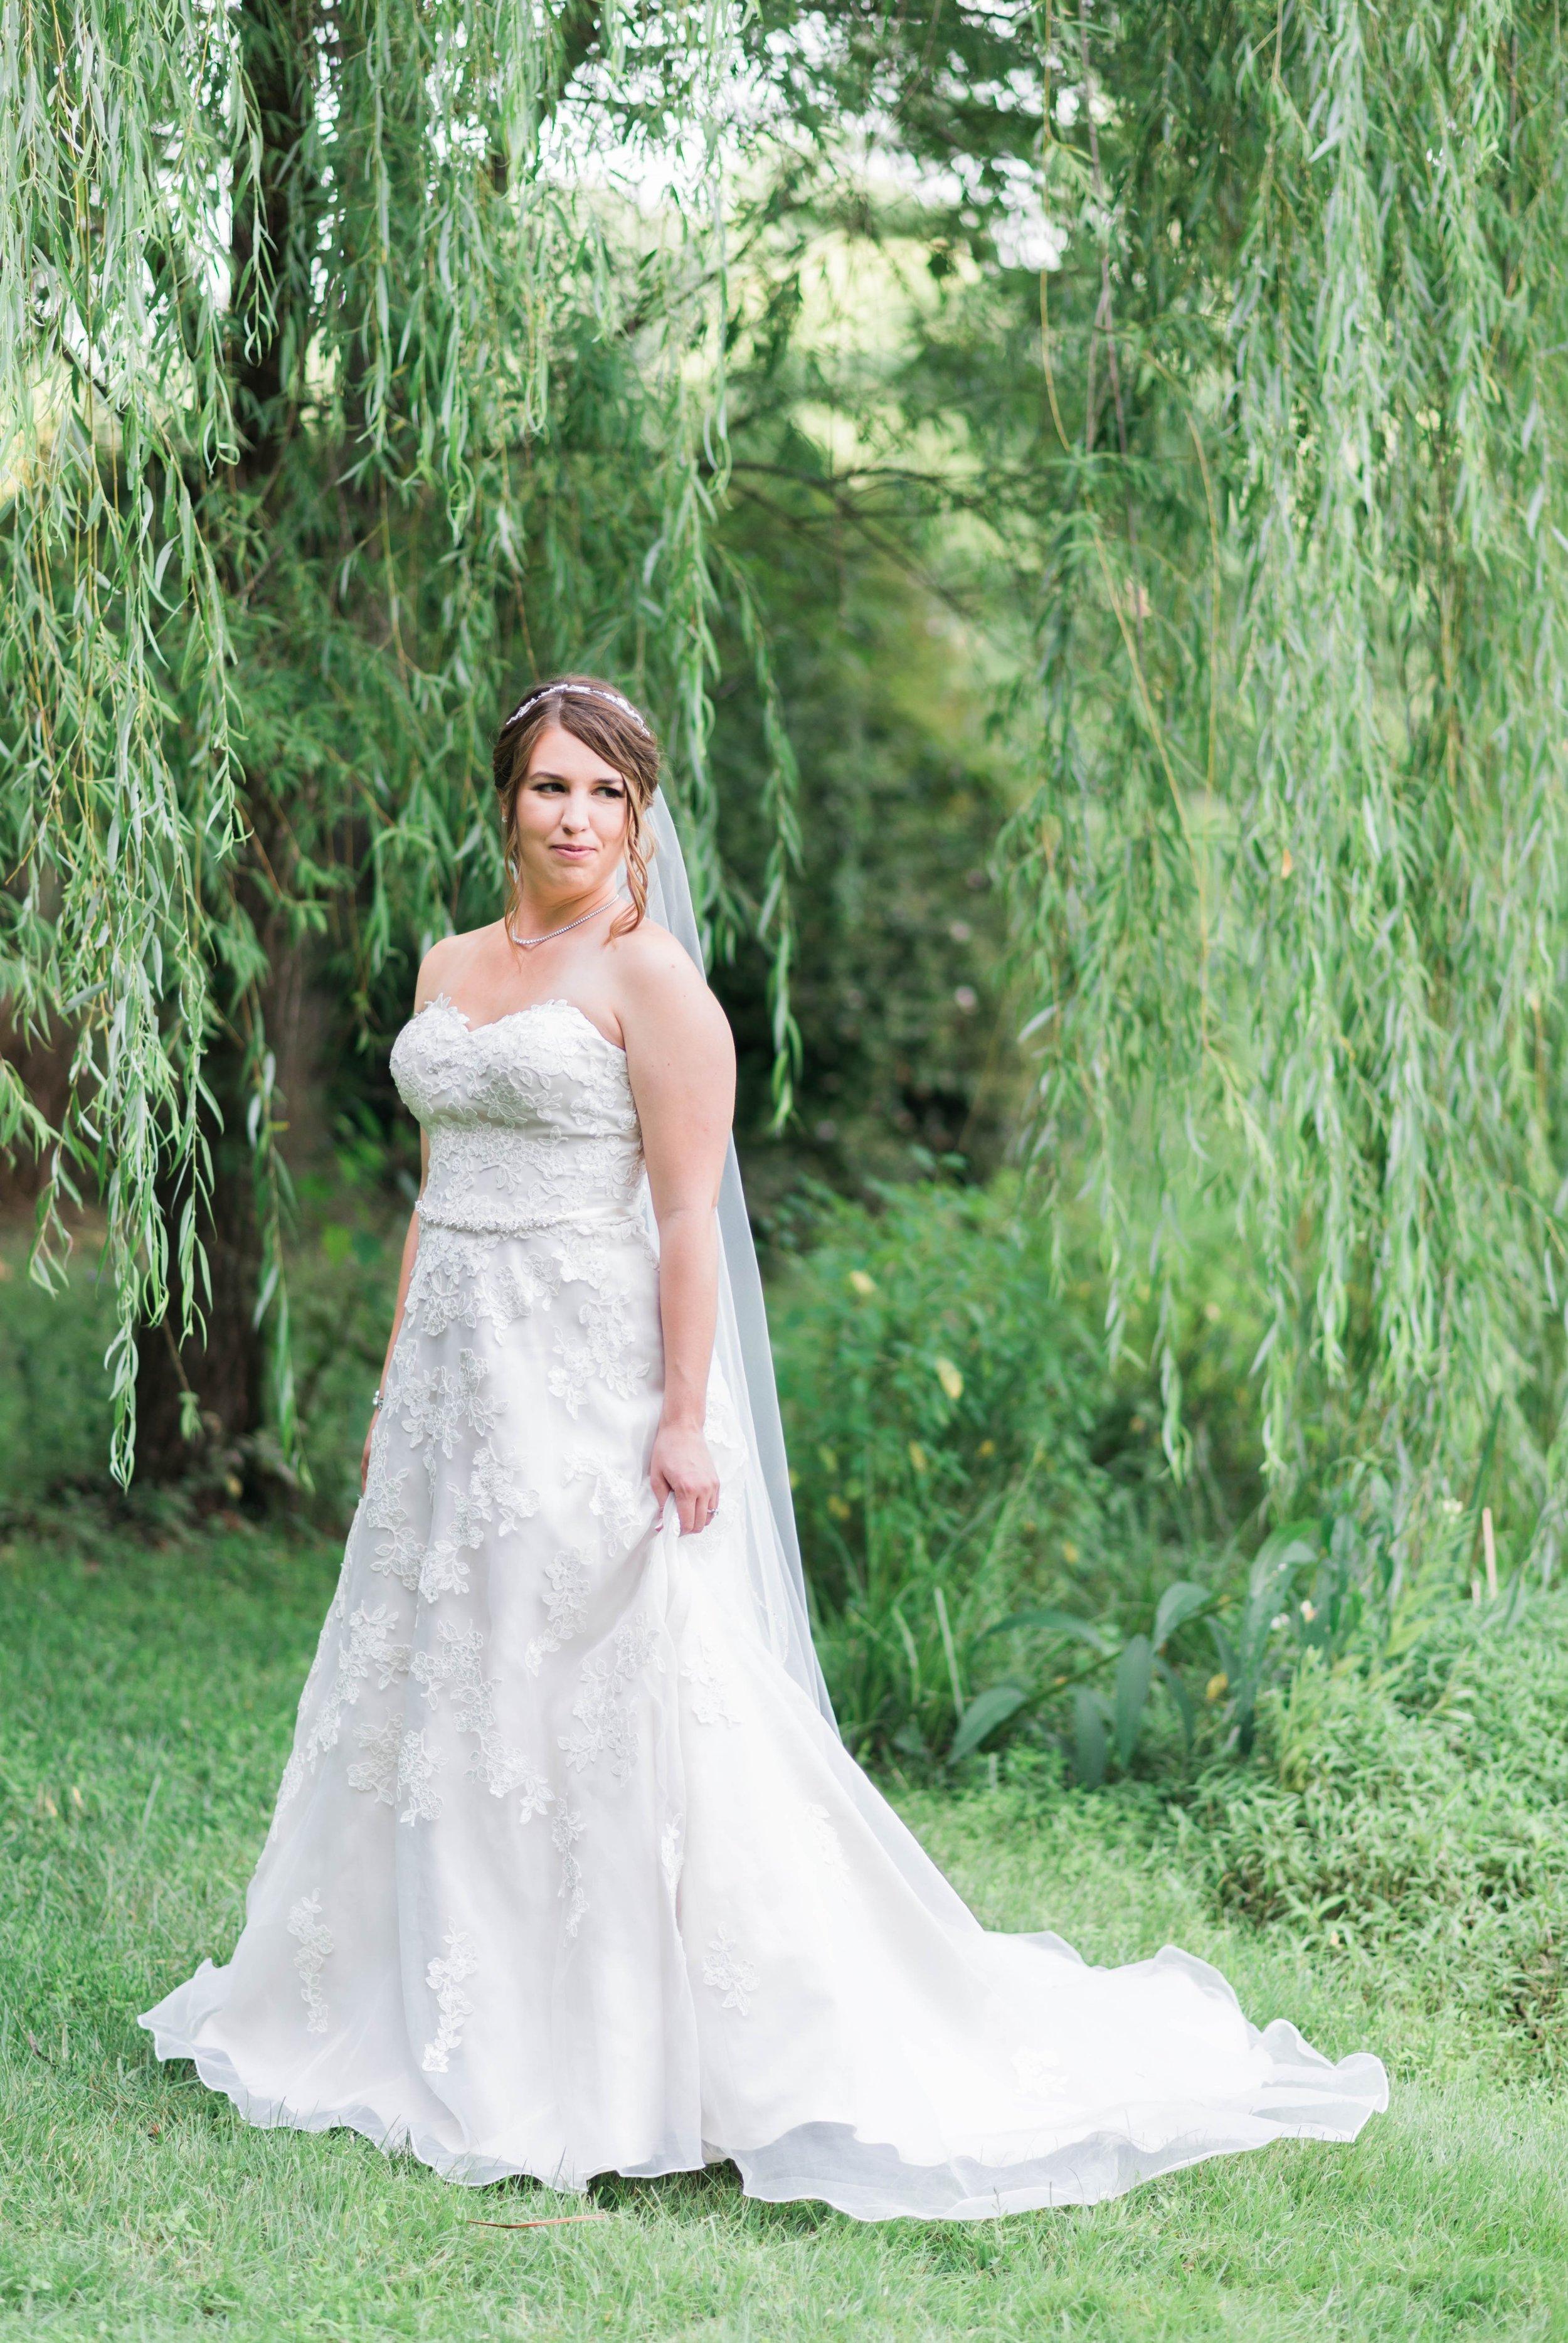 TheAtriumatMeadowlark_Virginiawedding photographer_lynchburgweddingphotographer_DCweddingPhotographer_KristinAaron 45.jpg